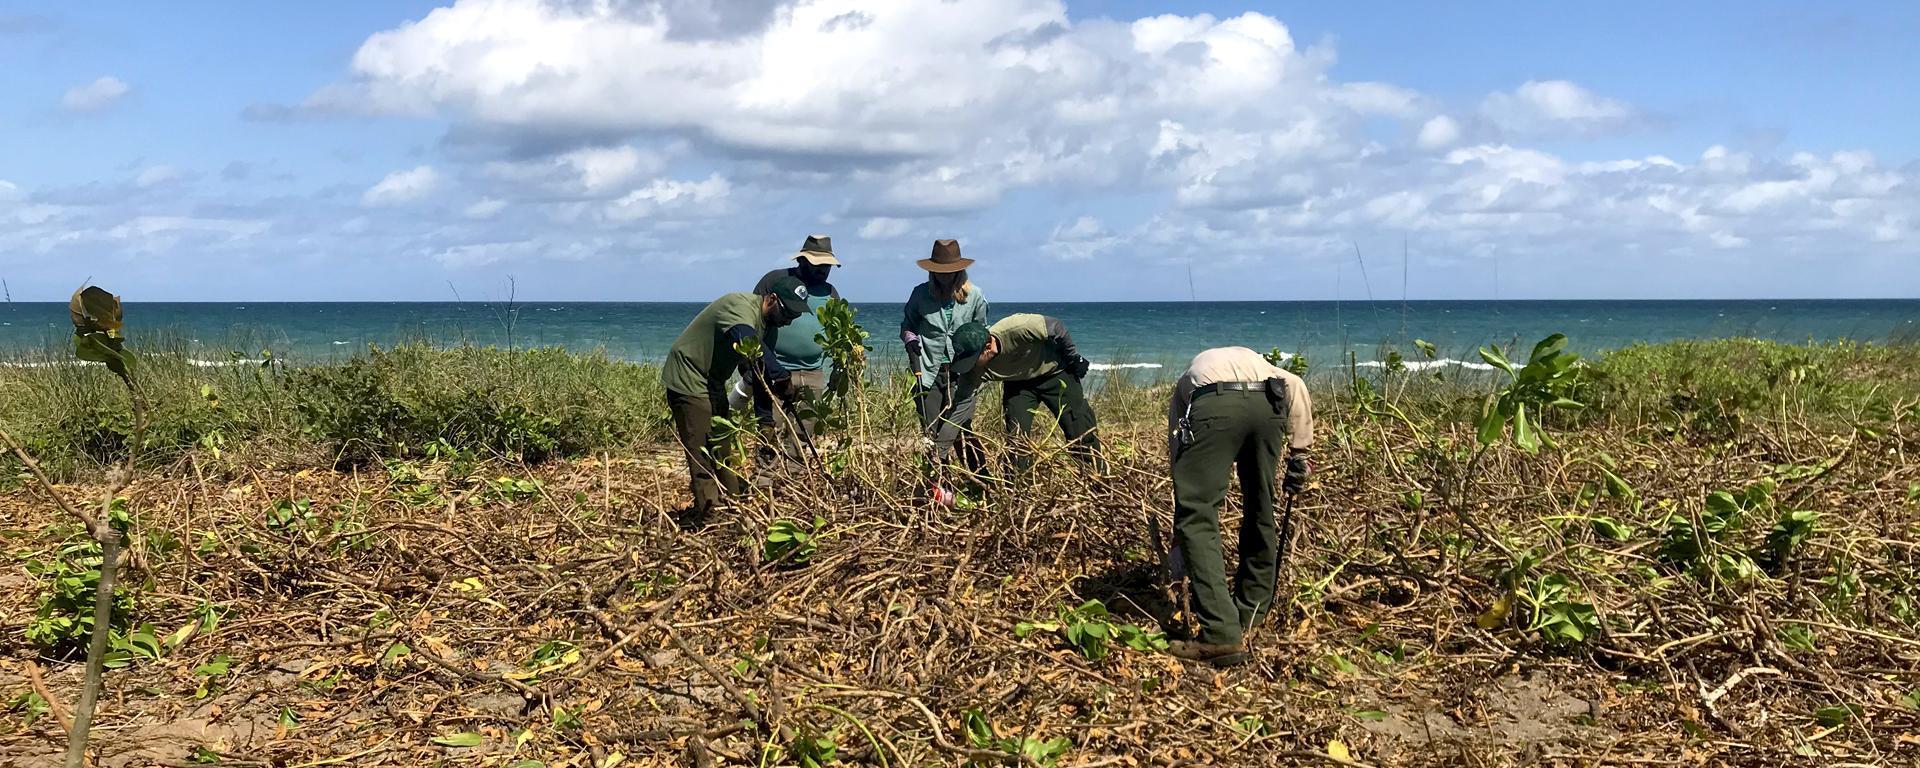 Ecosystem Restoration and Management staff